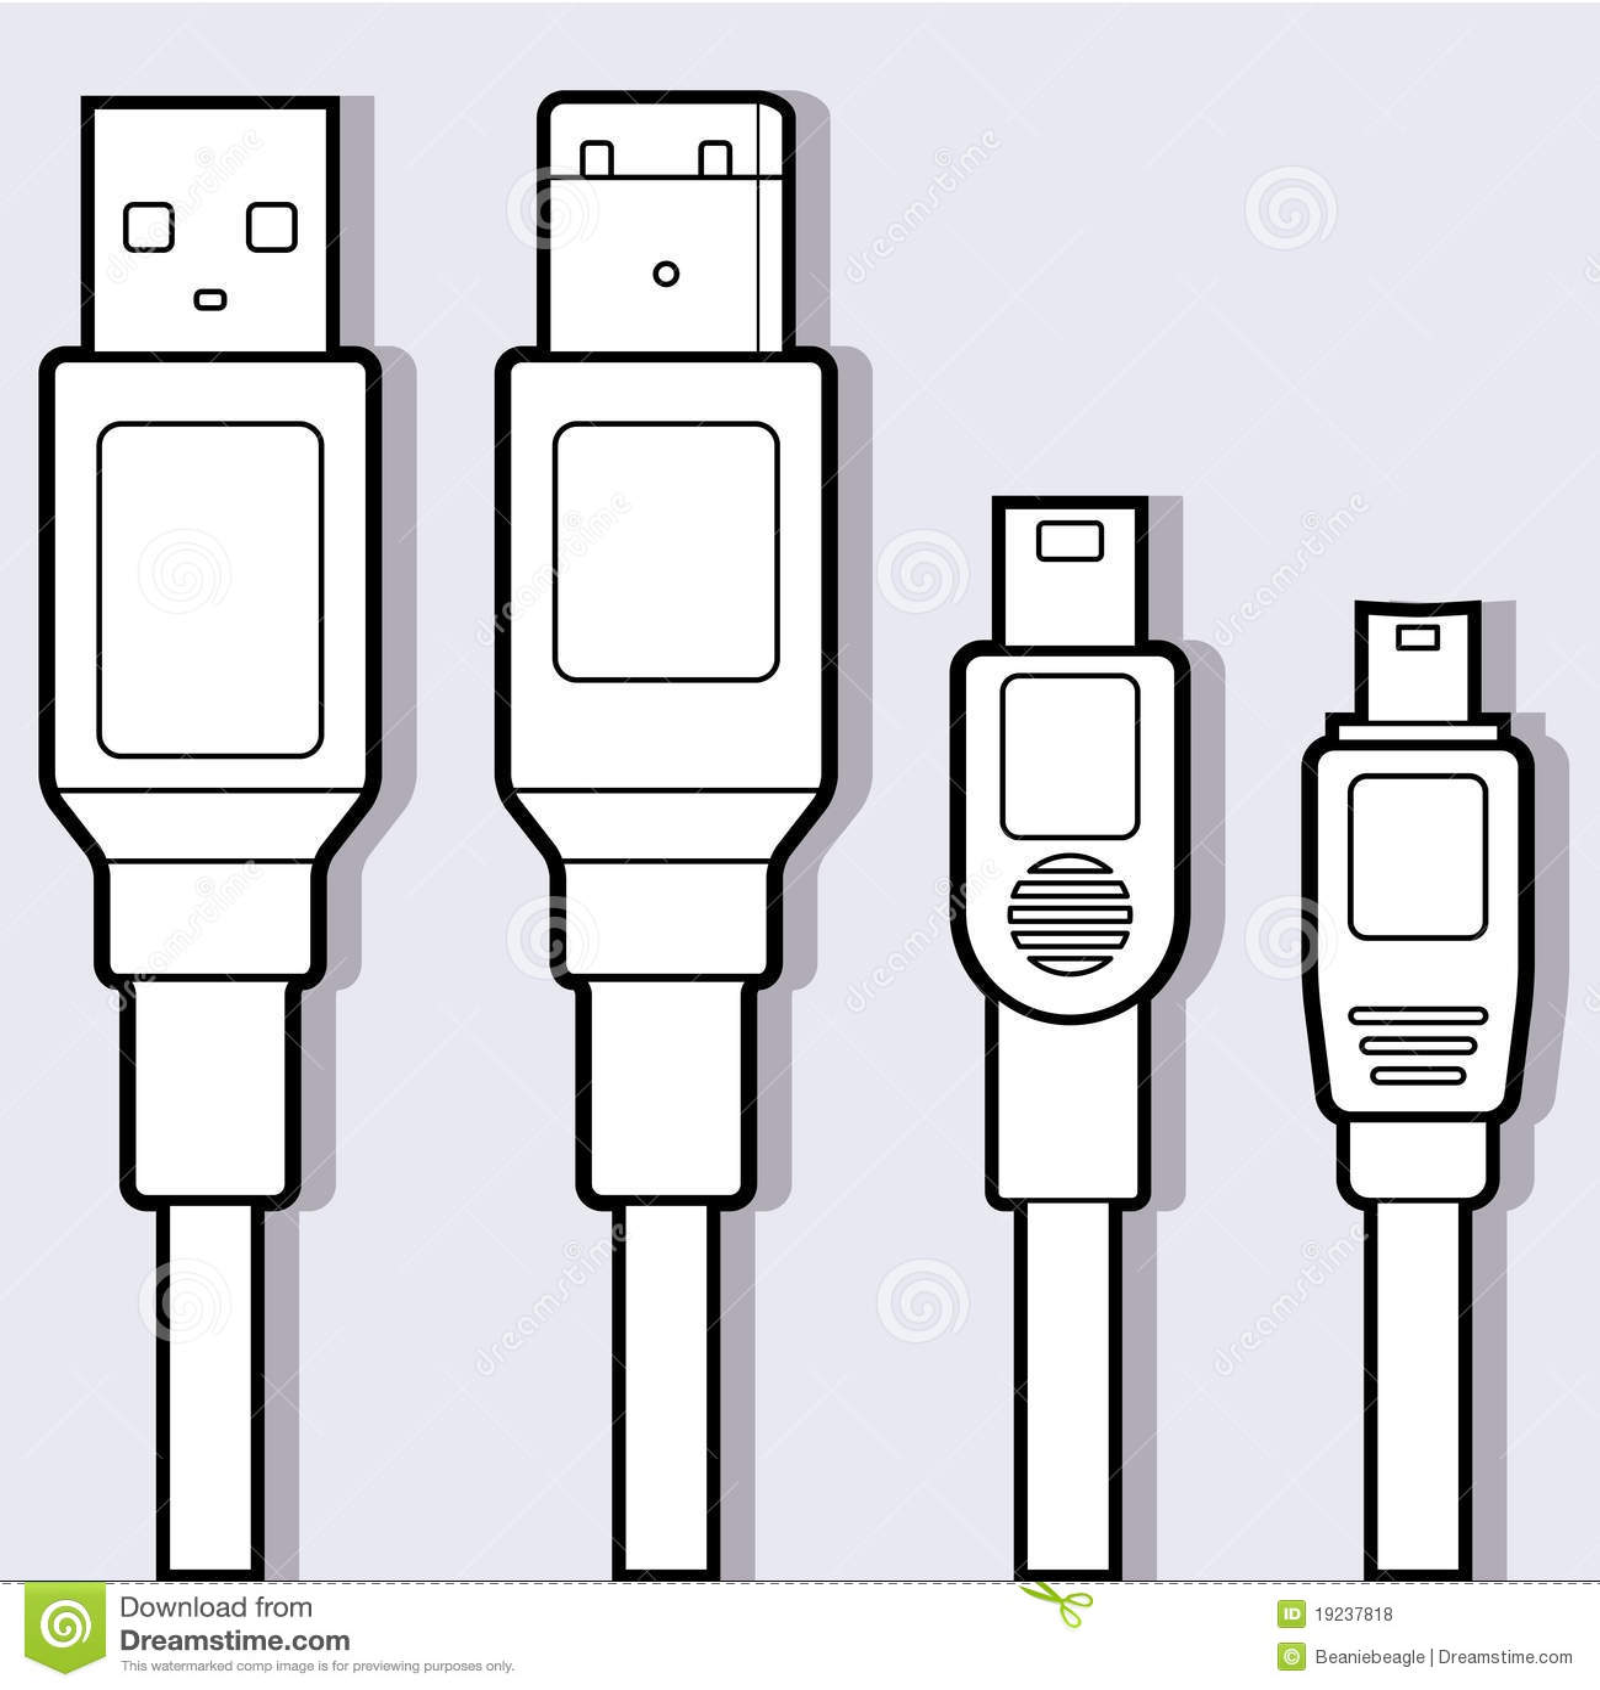 Computer Cables Diagram Royalty Free Stock Photos